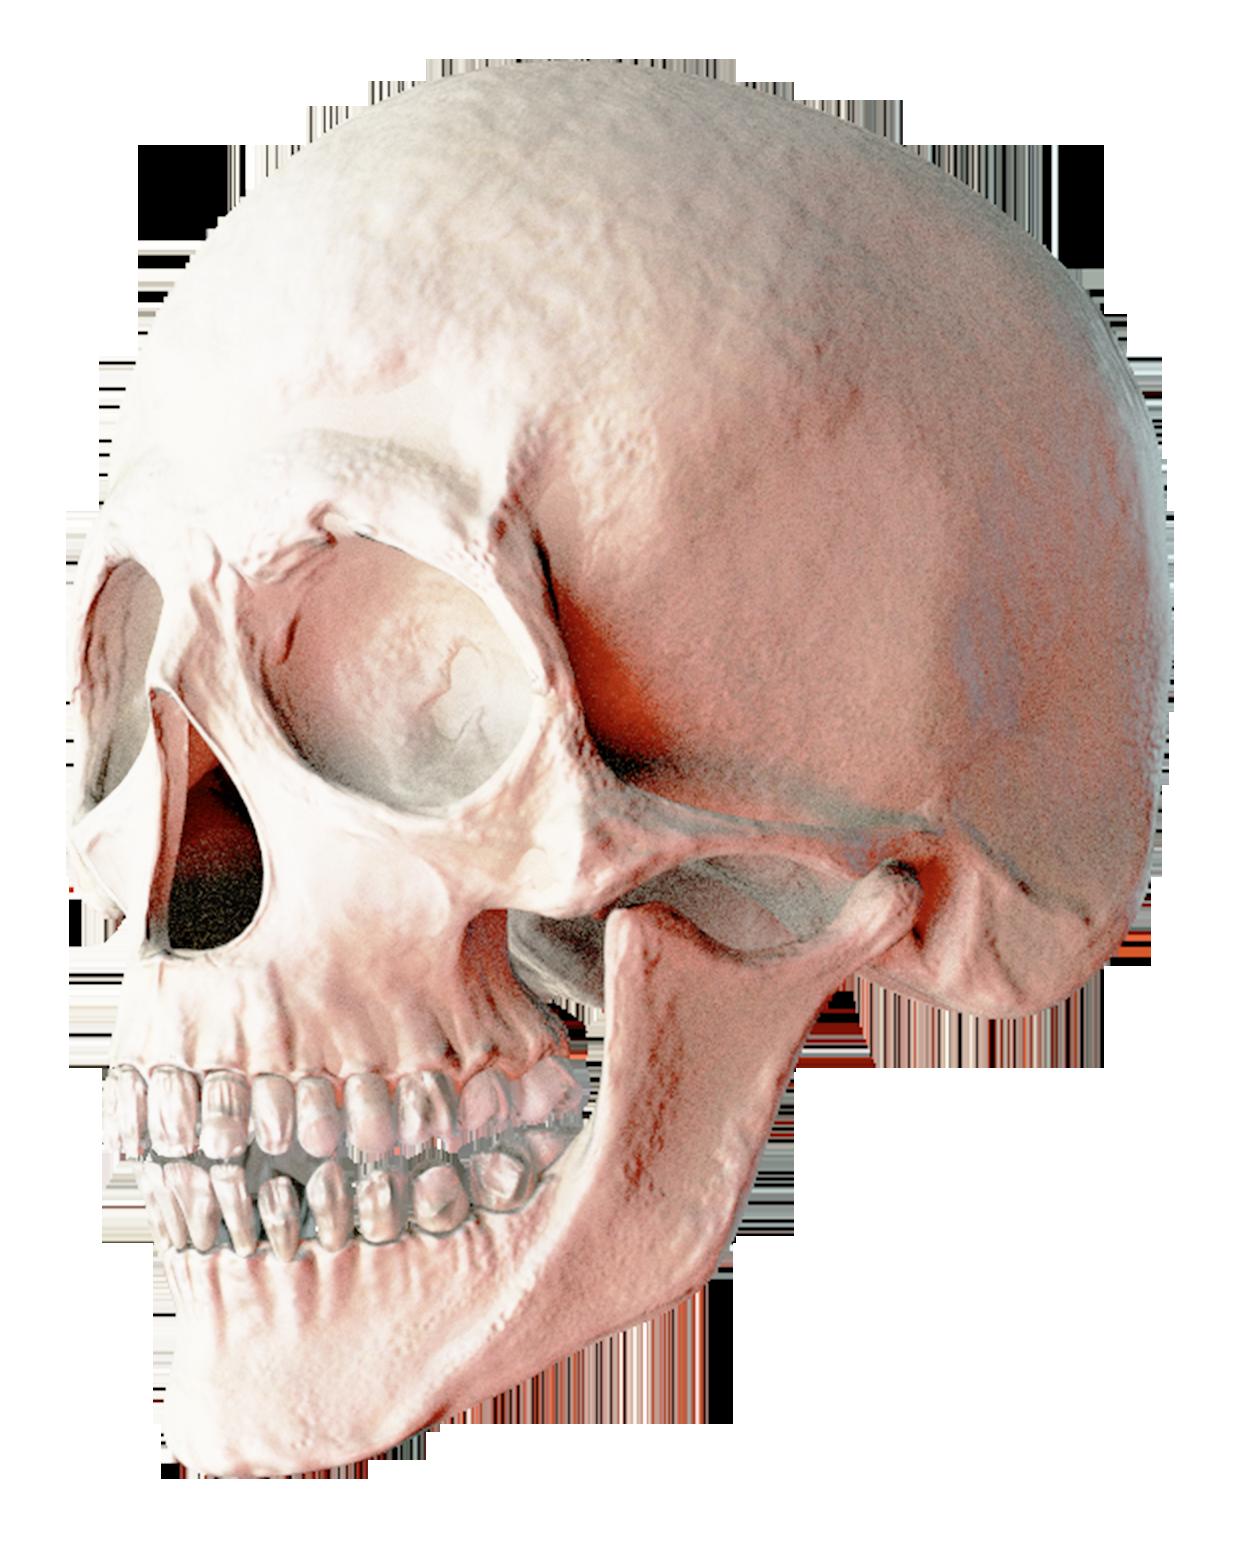 Skull Png Image Skull Png Png Images